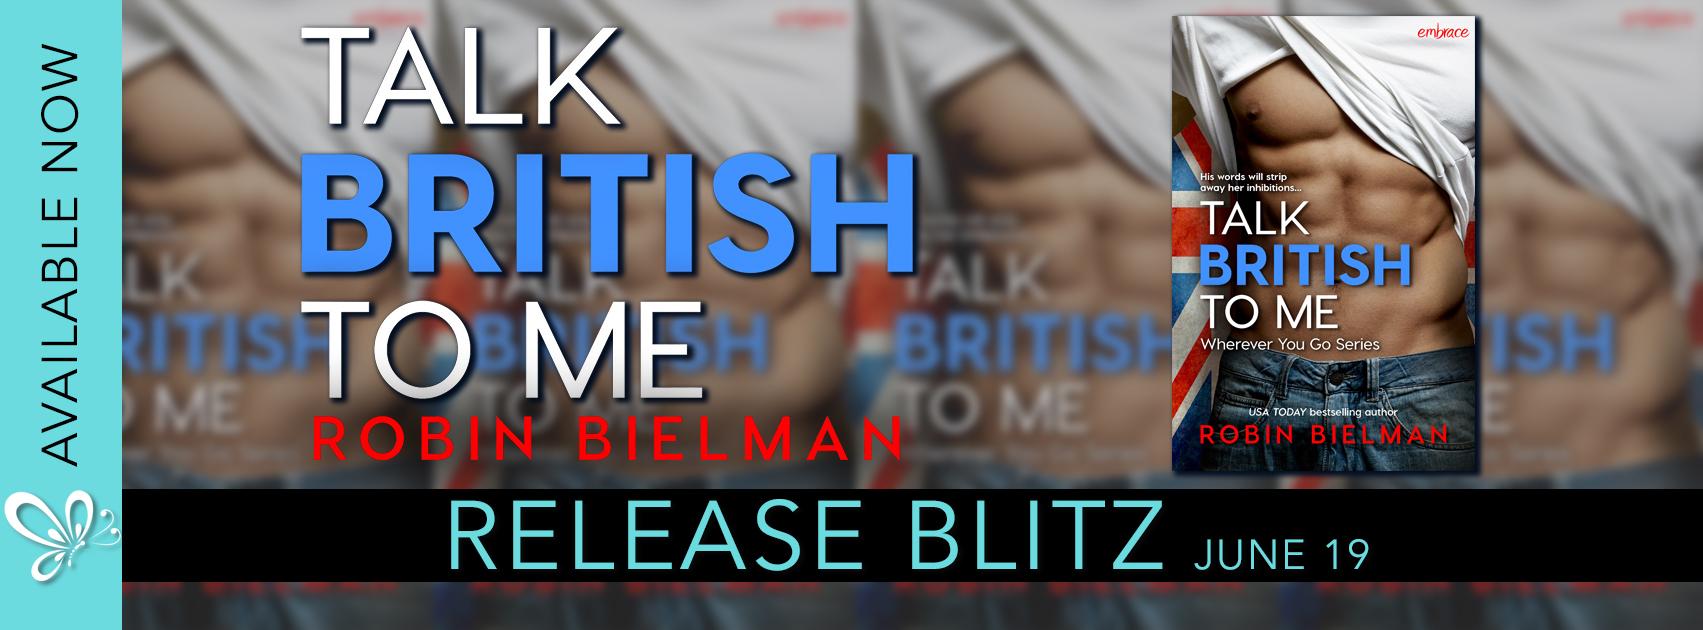 Release Blitz:  Talk British to Me by Robin Bielman